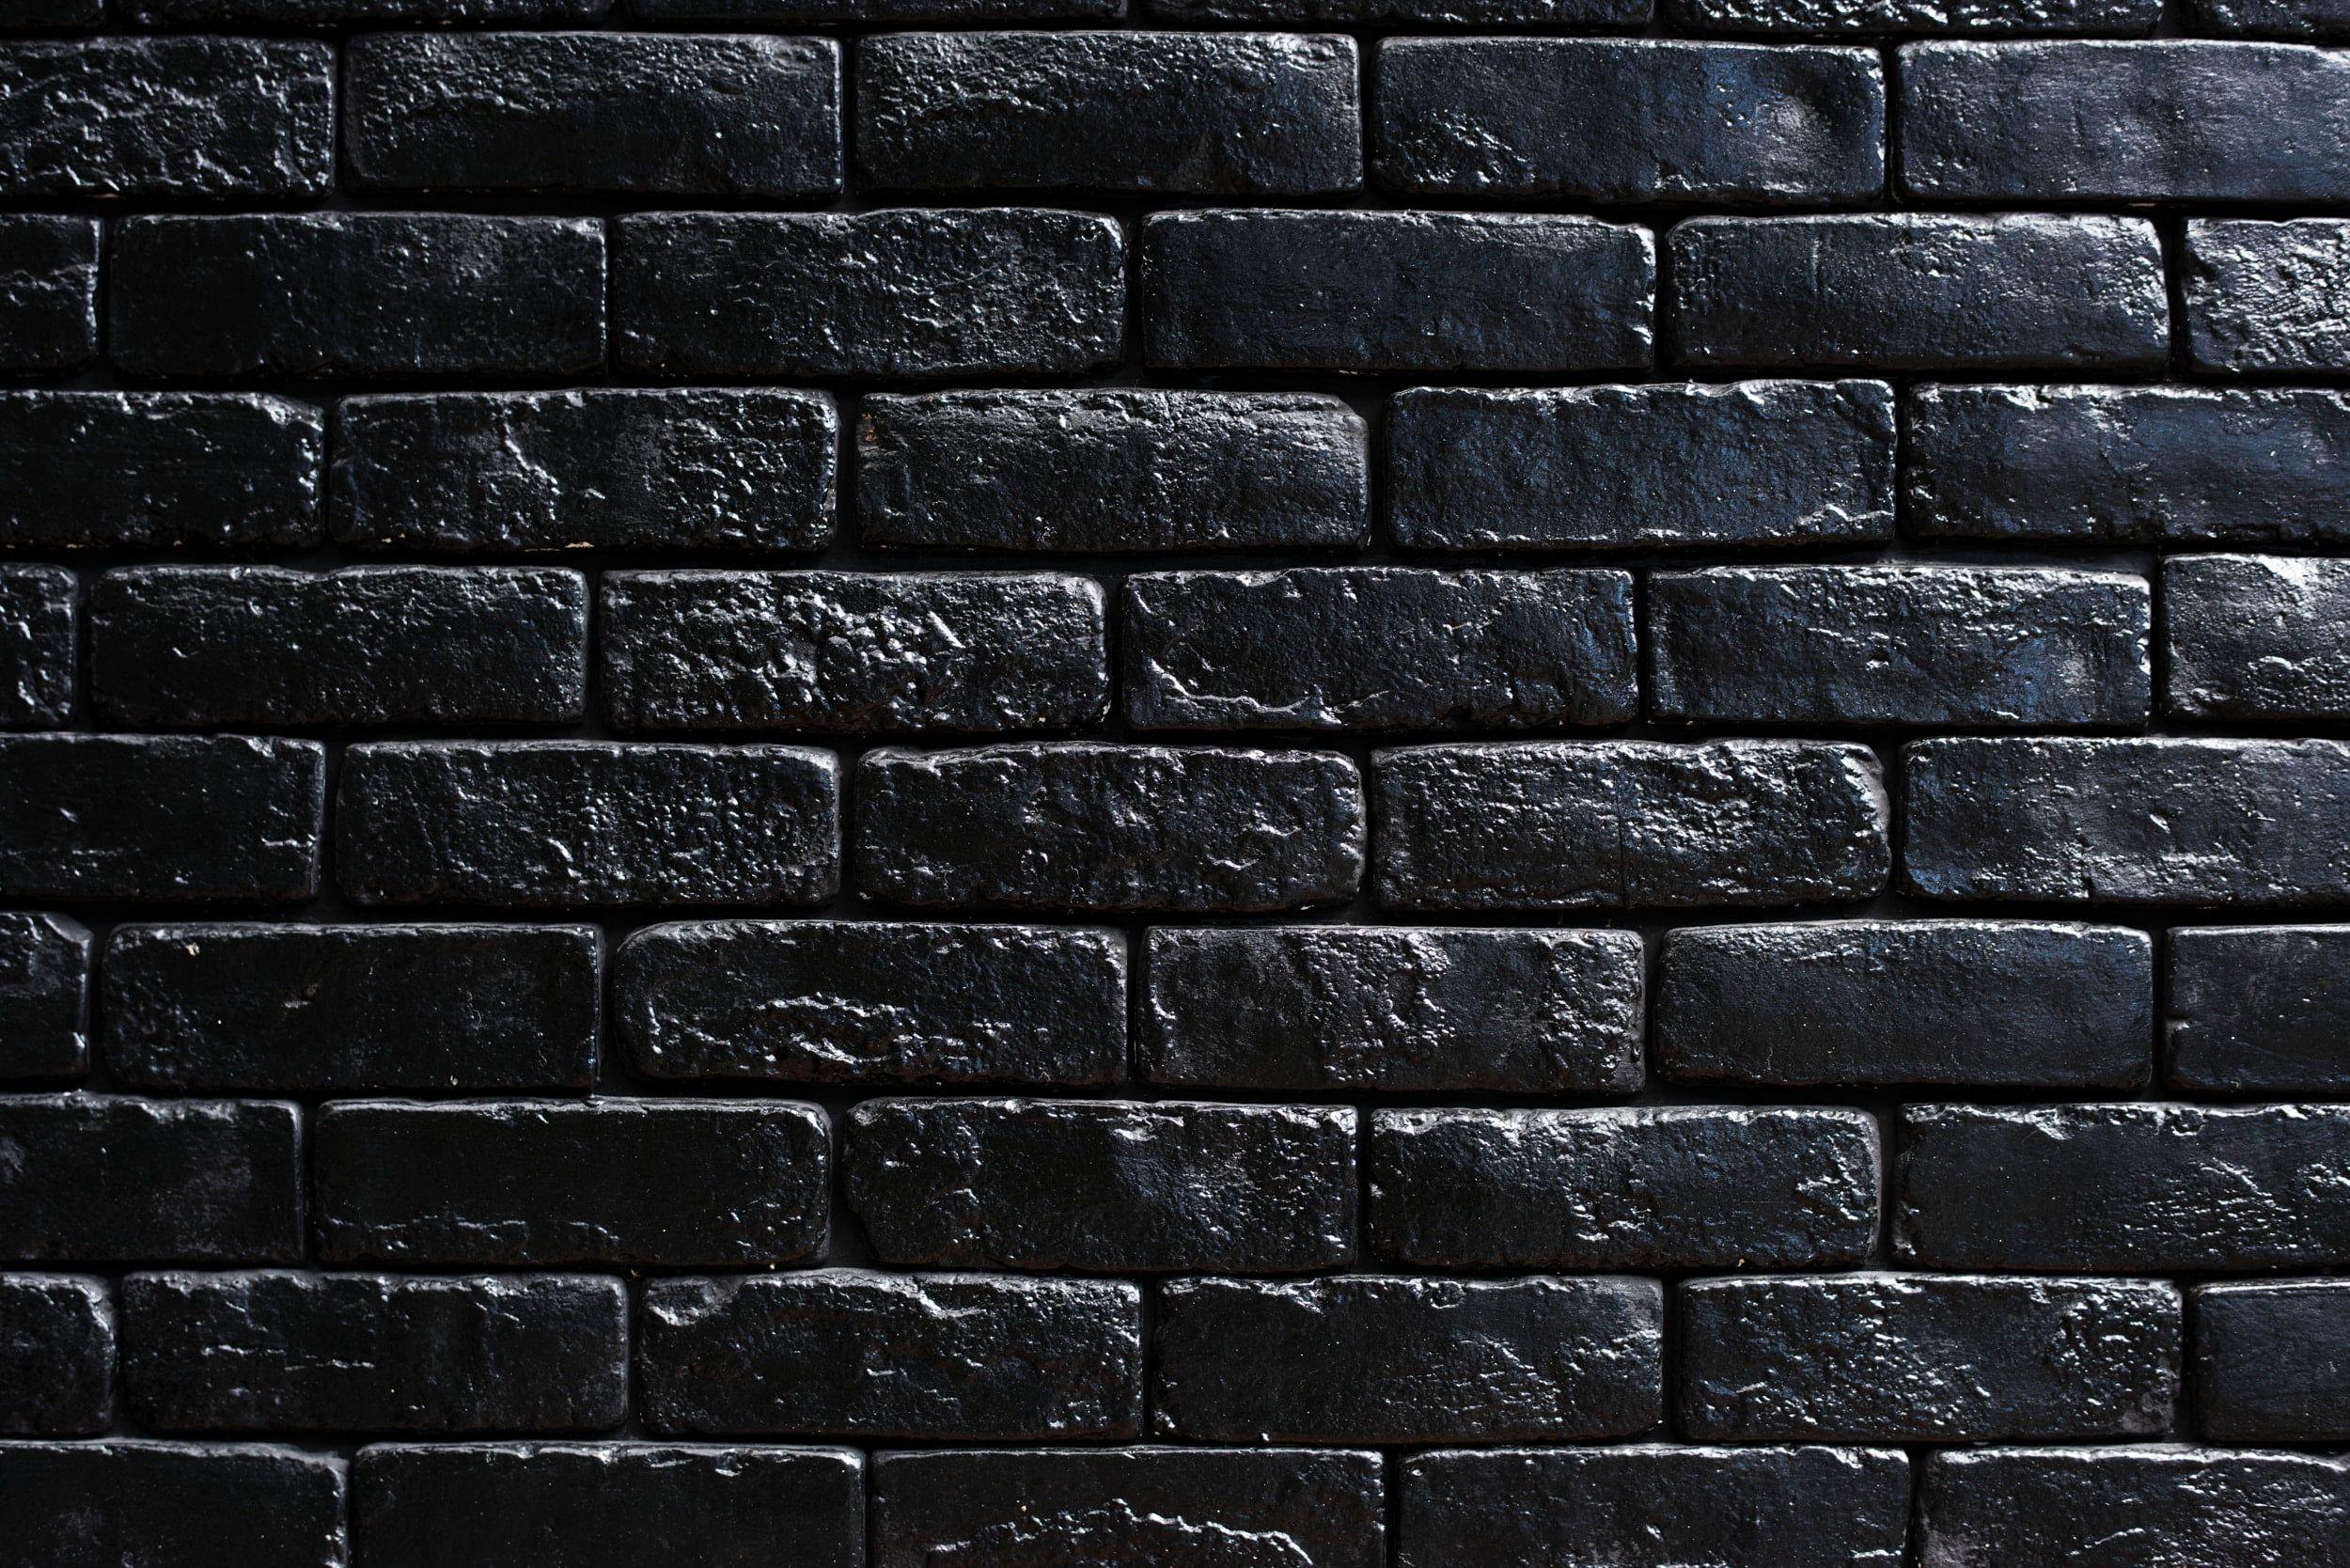 Black Wall Bricks Wall Bricks Black Paint 1080p Wallpaper Hdwallpaper Desktop Black Brick Wall Black Brick Textured Walls